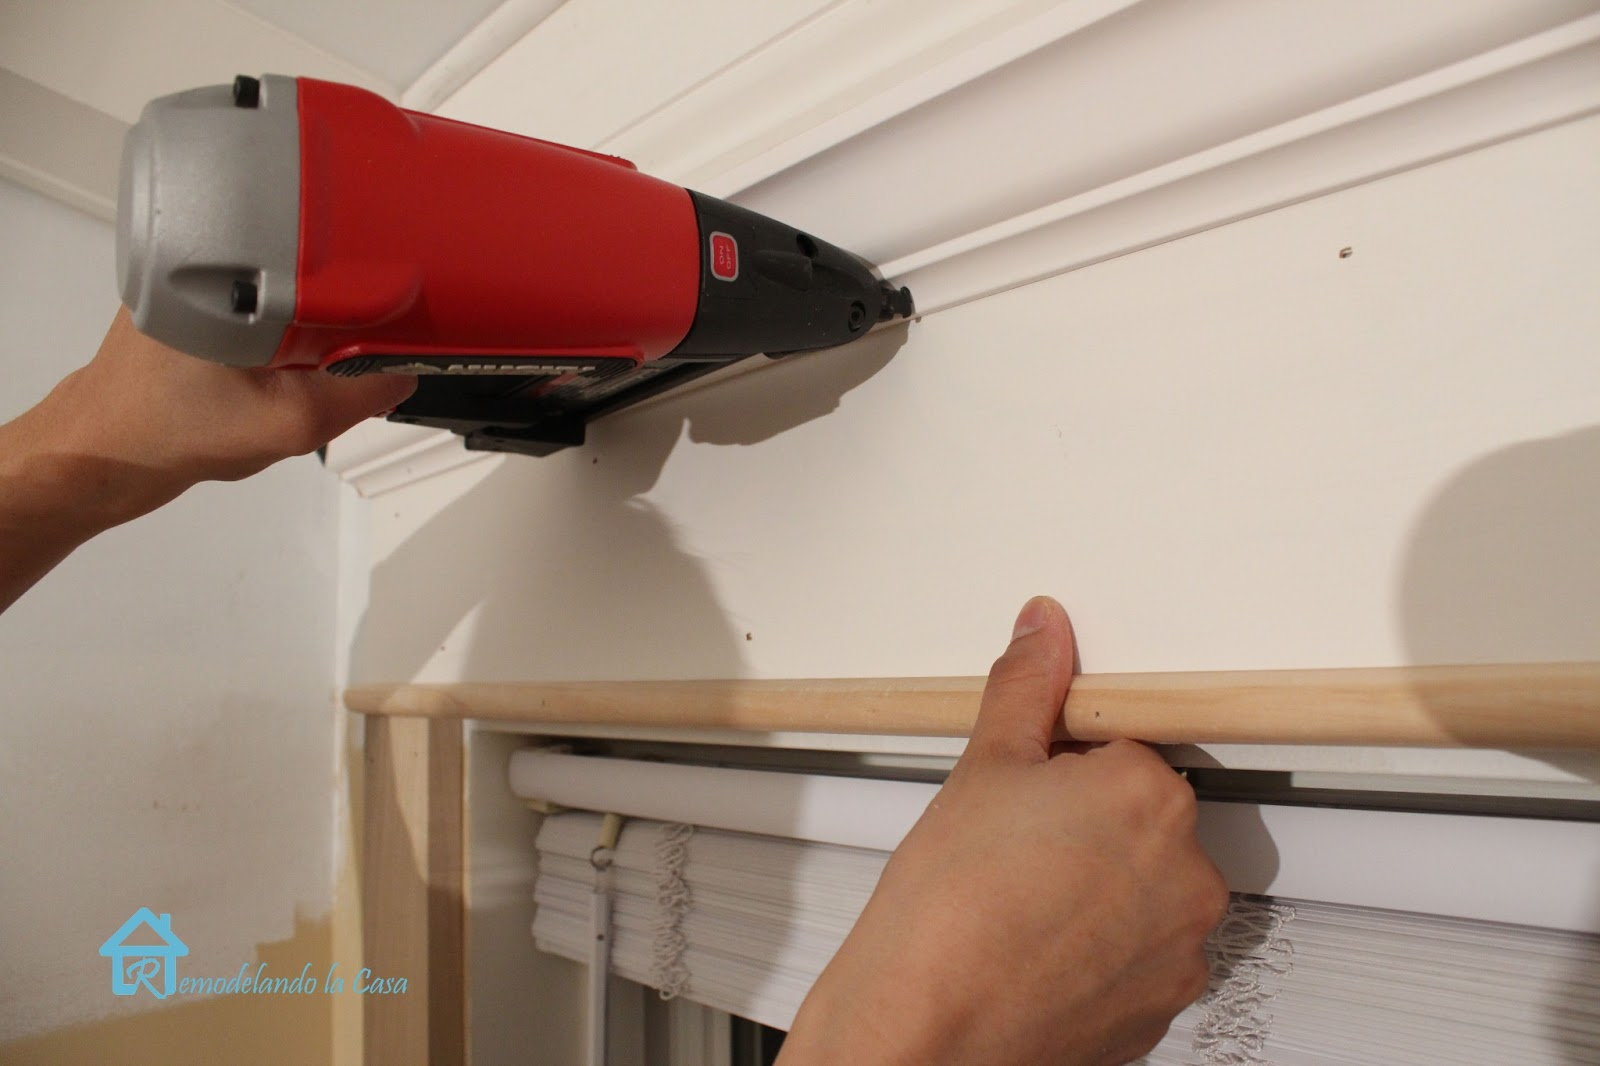 How To Install Window Trim Remodelando La Casa